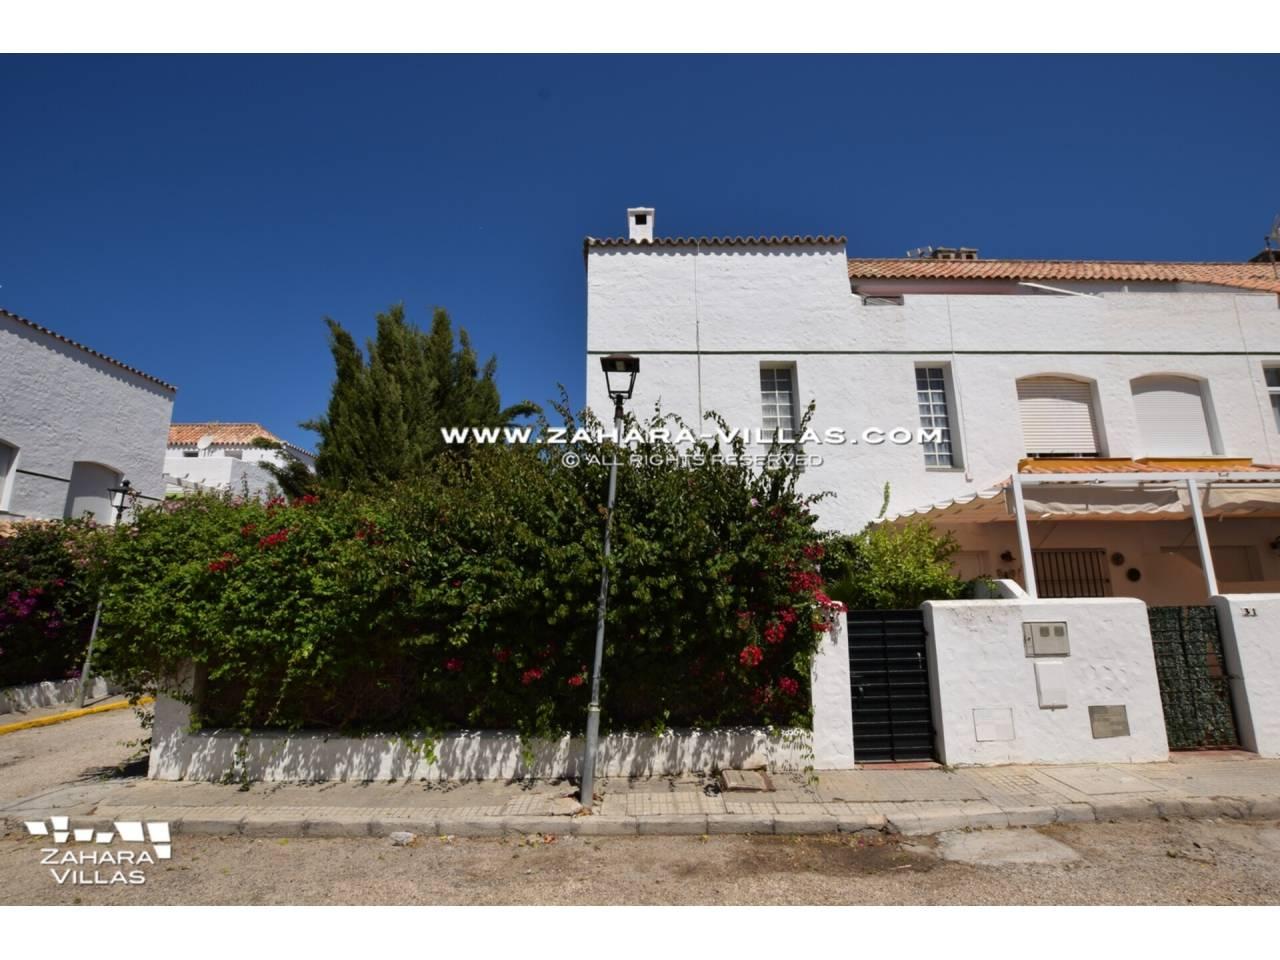 Imagen 15 de House for sale close to the beach, with sea views in Zahara de los Atunes